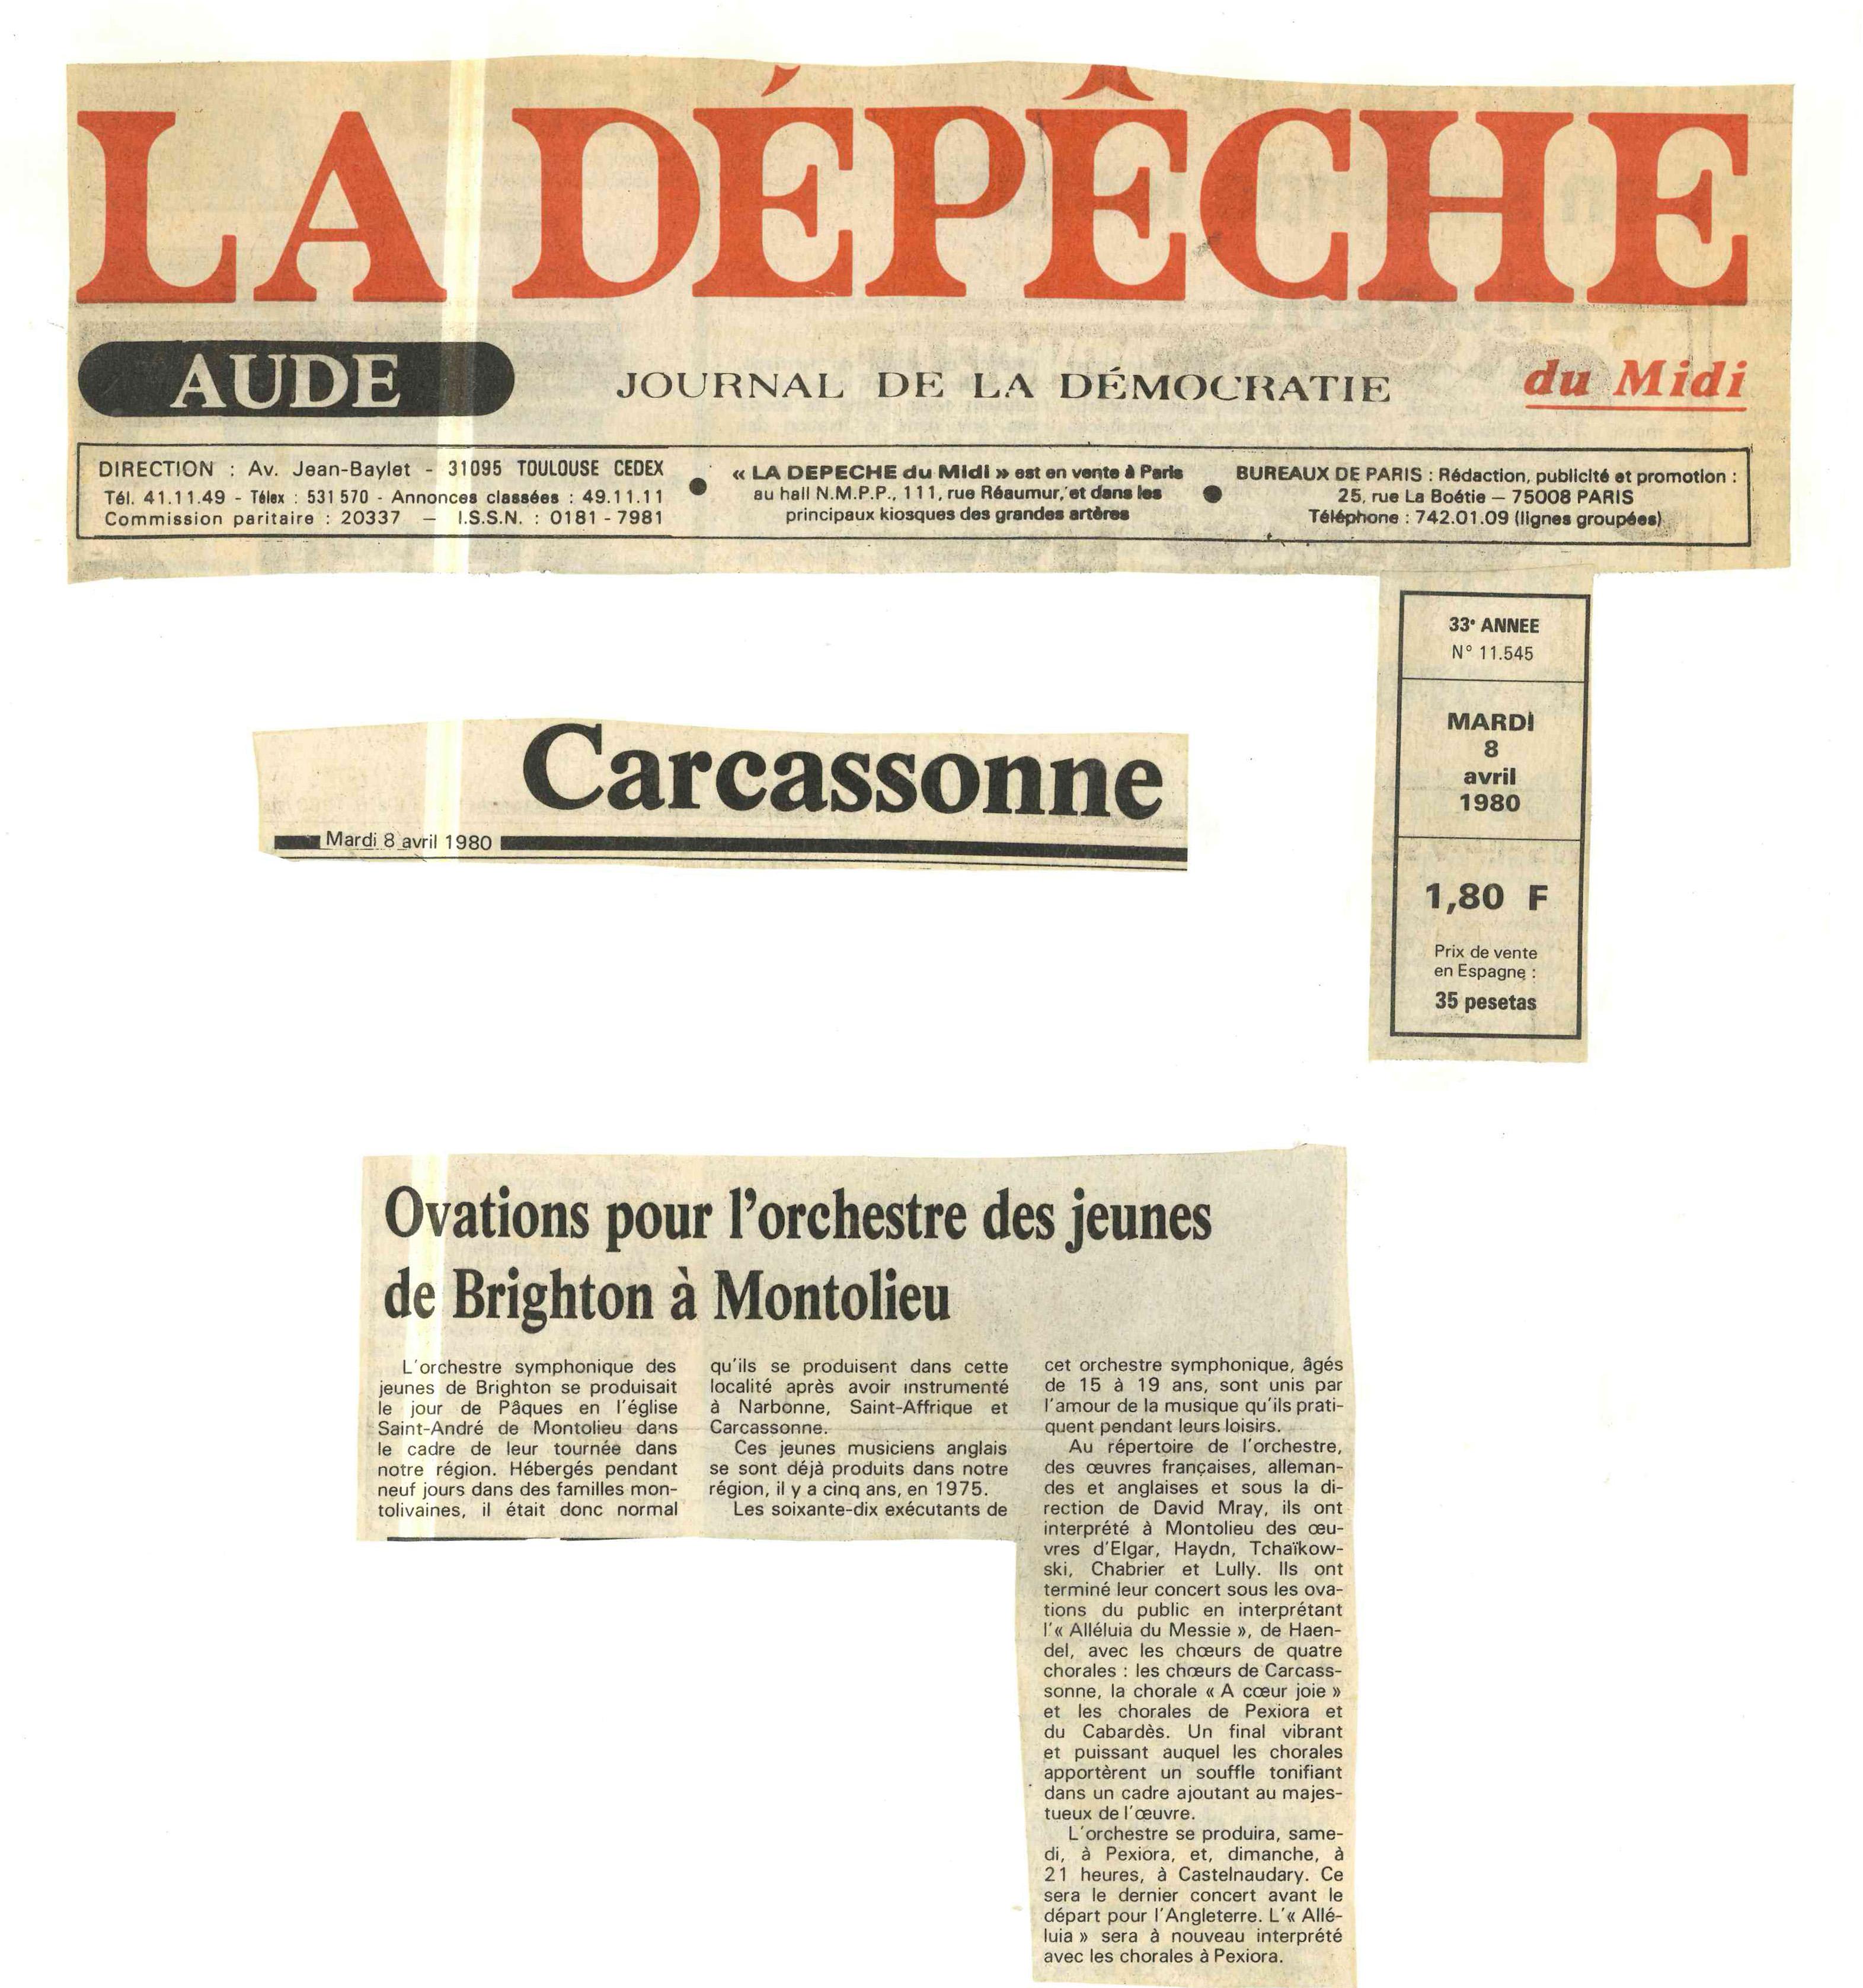 00204-La Depeche, 8th April 1980.jpg